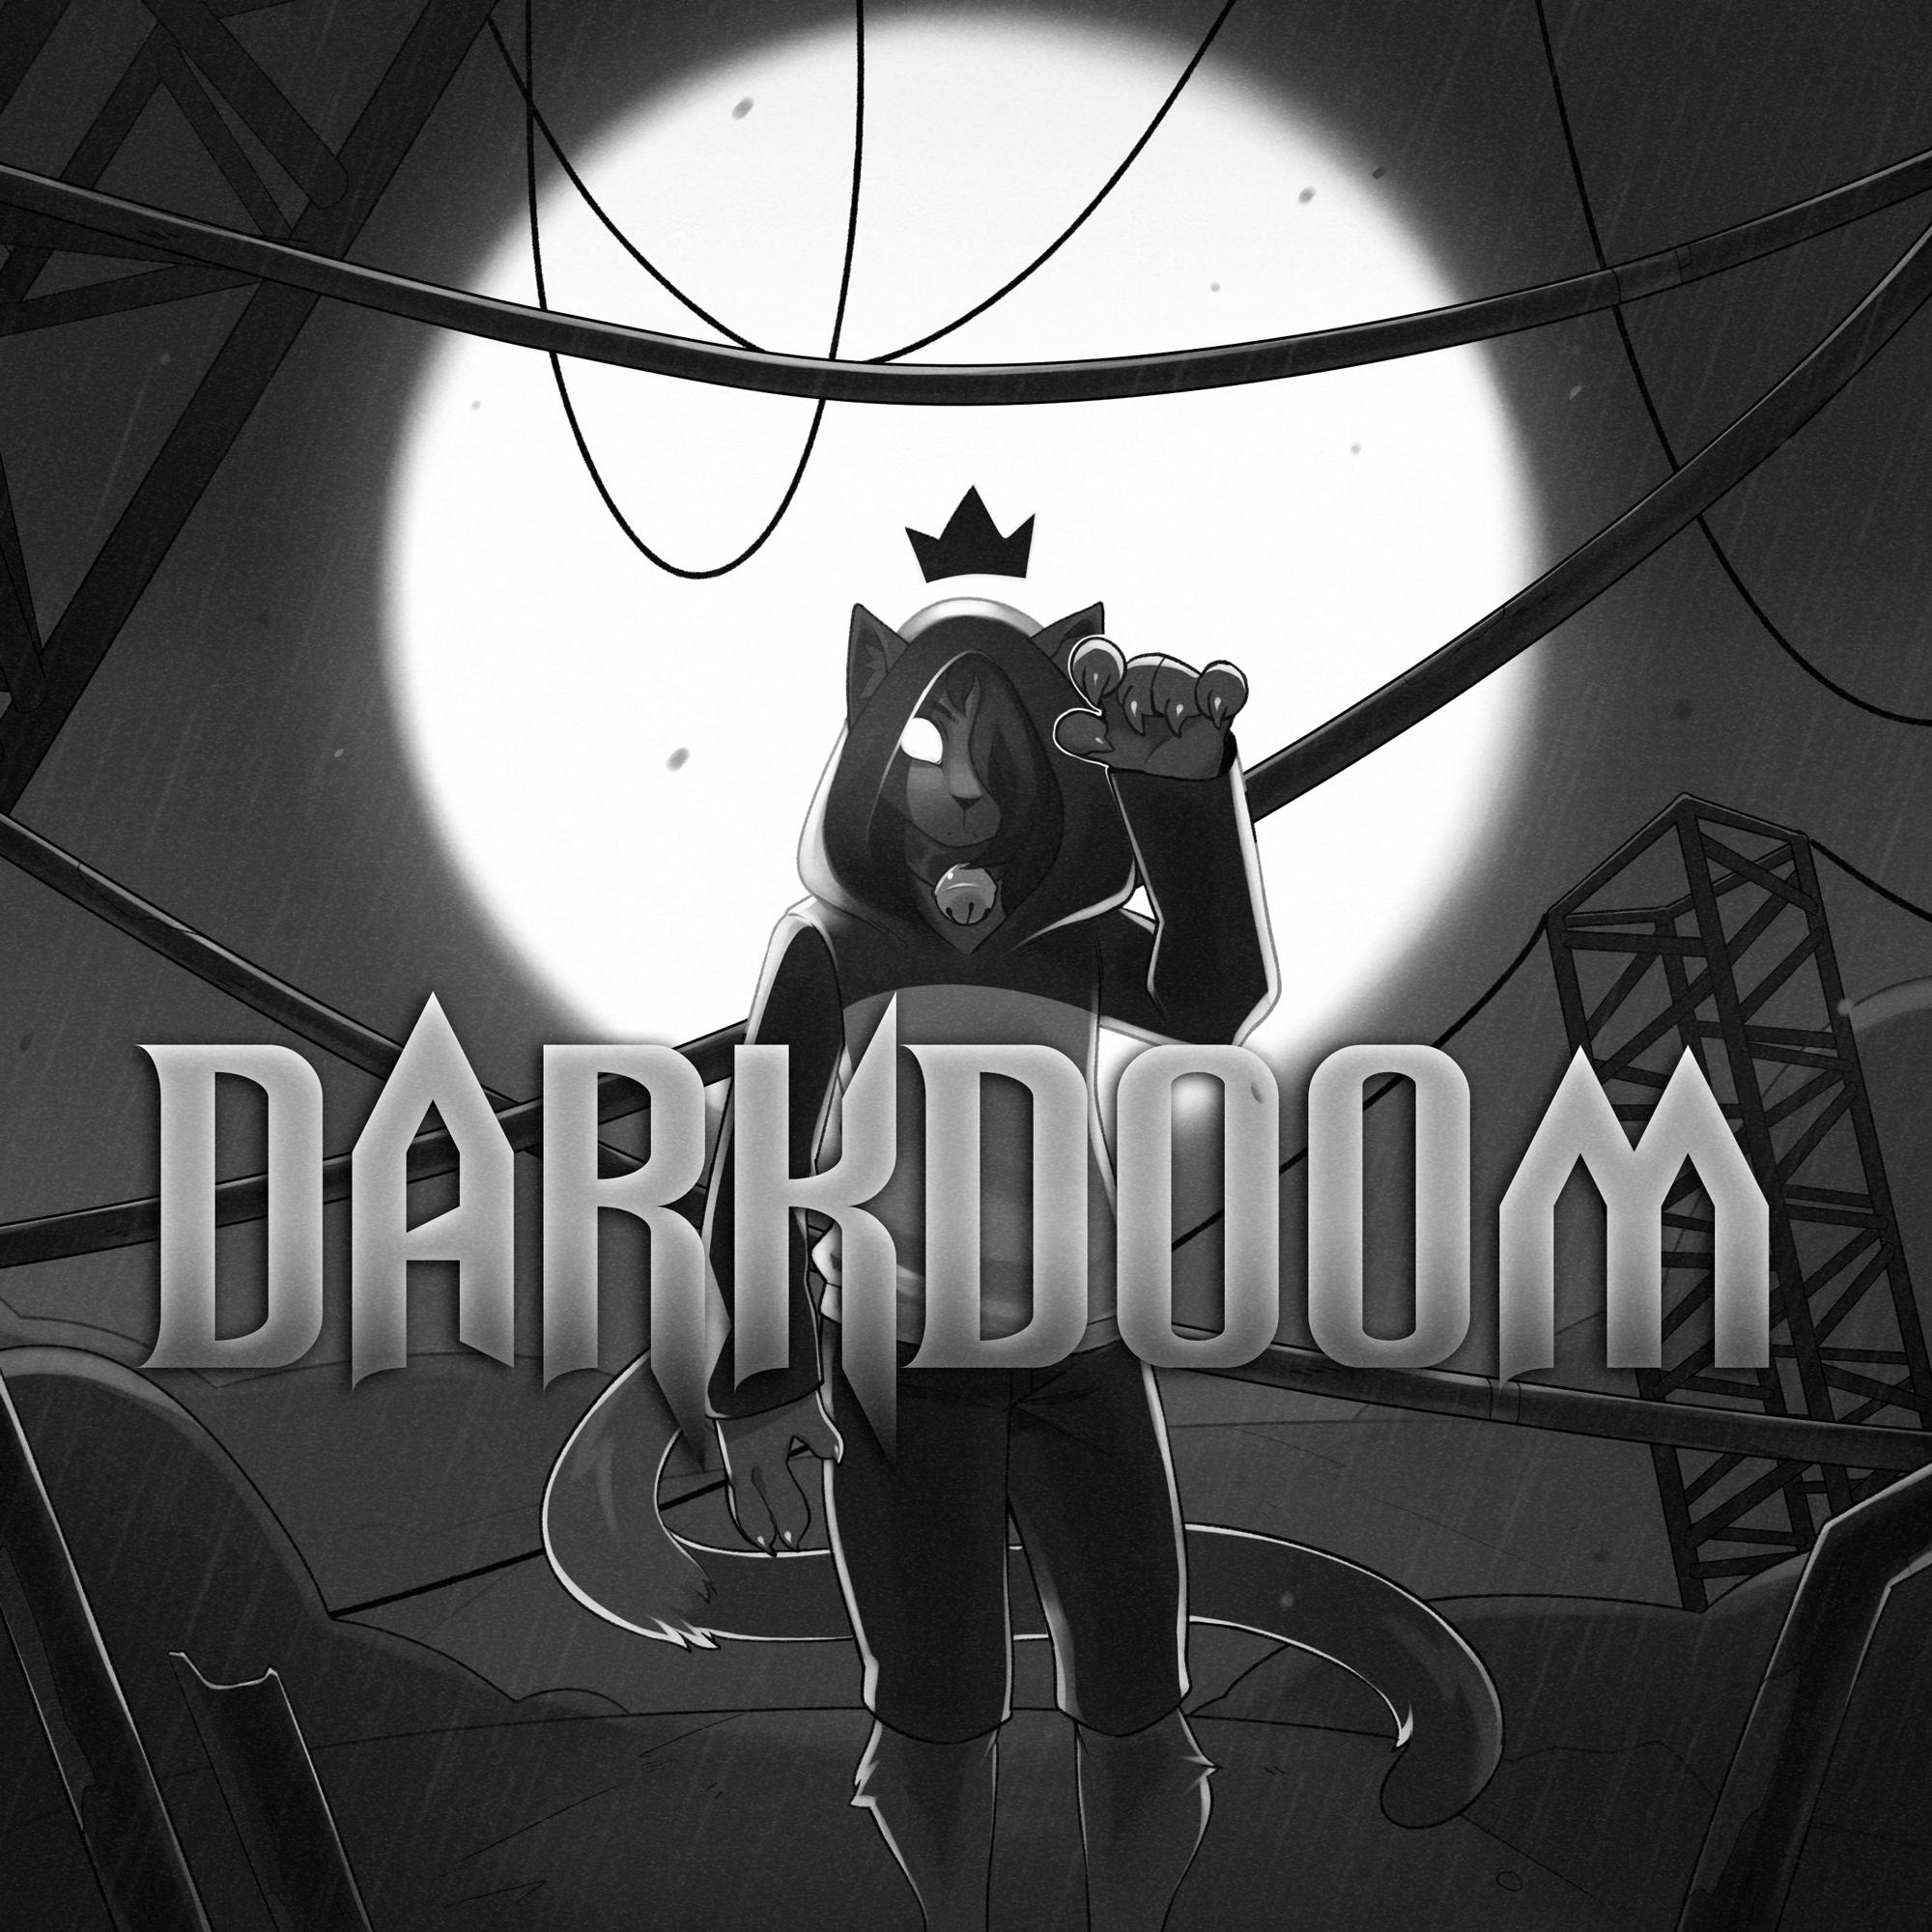 An album of spooky darker tones and experiments.